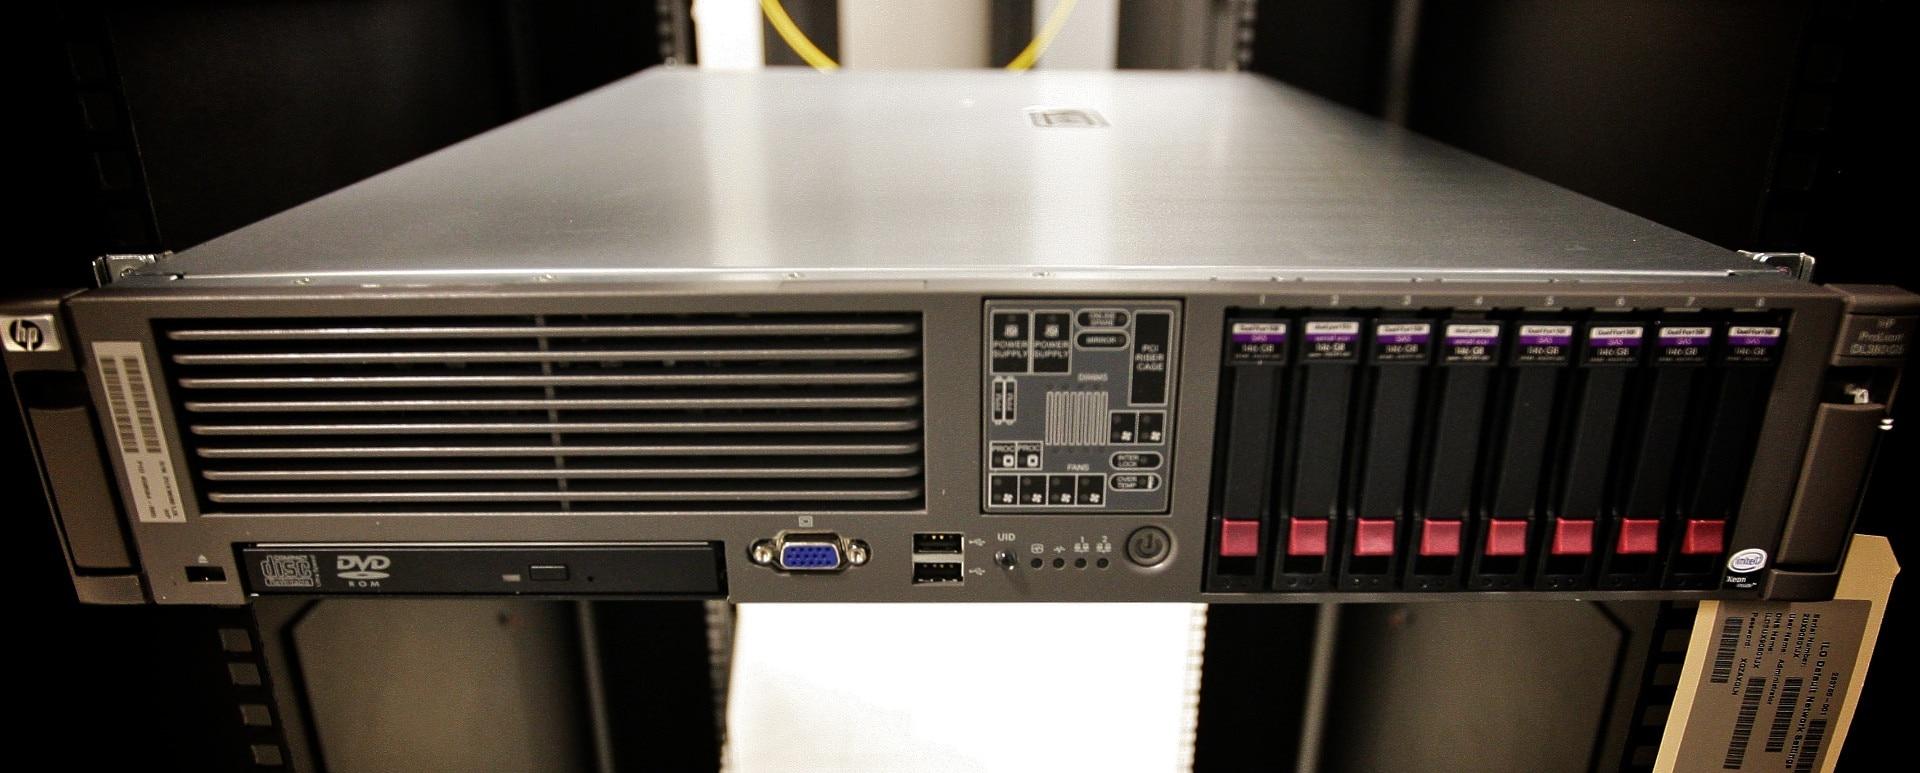 HP Proliant DL 380G5 Server